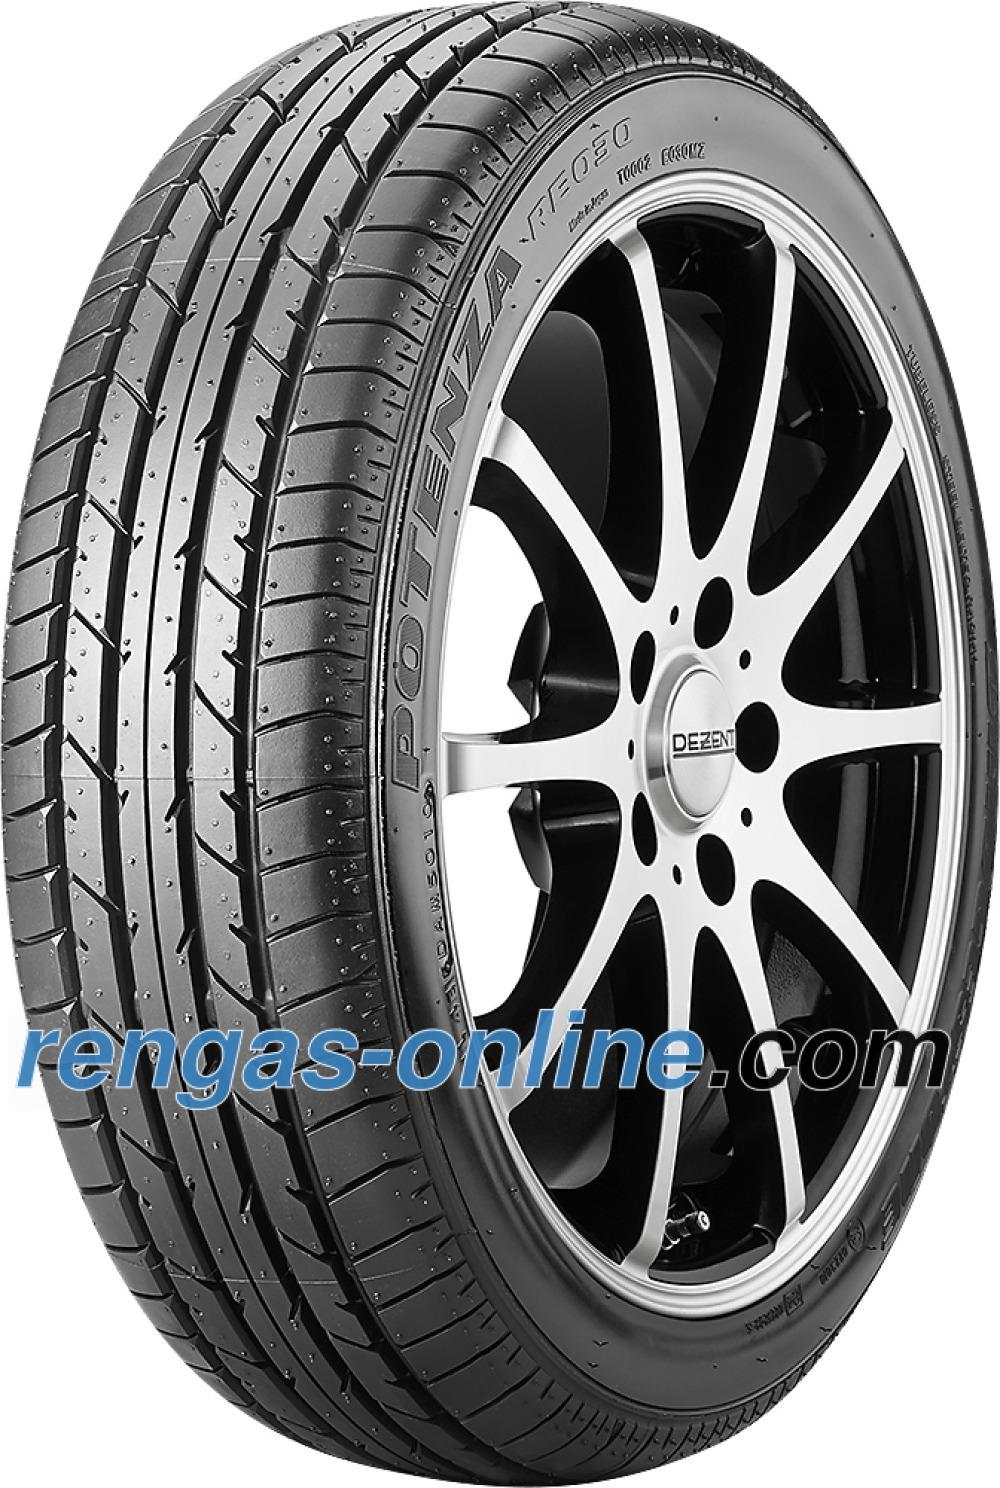 bridgestone-potenza-re-030-16555-r15-75v